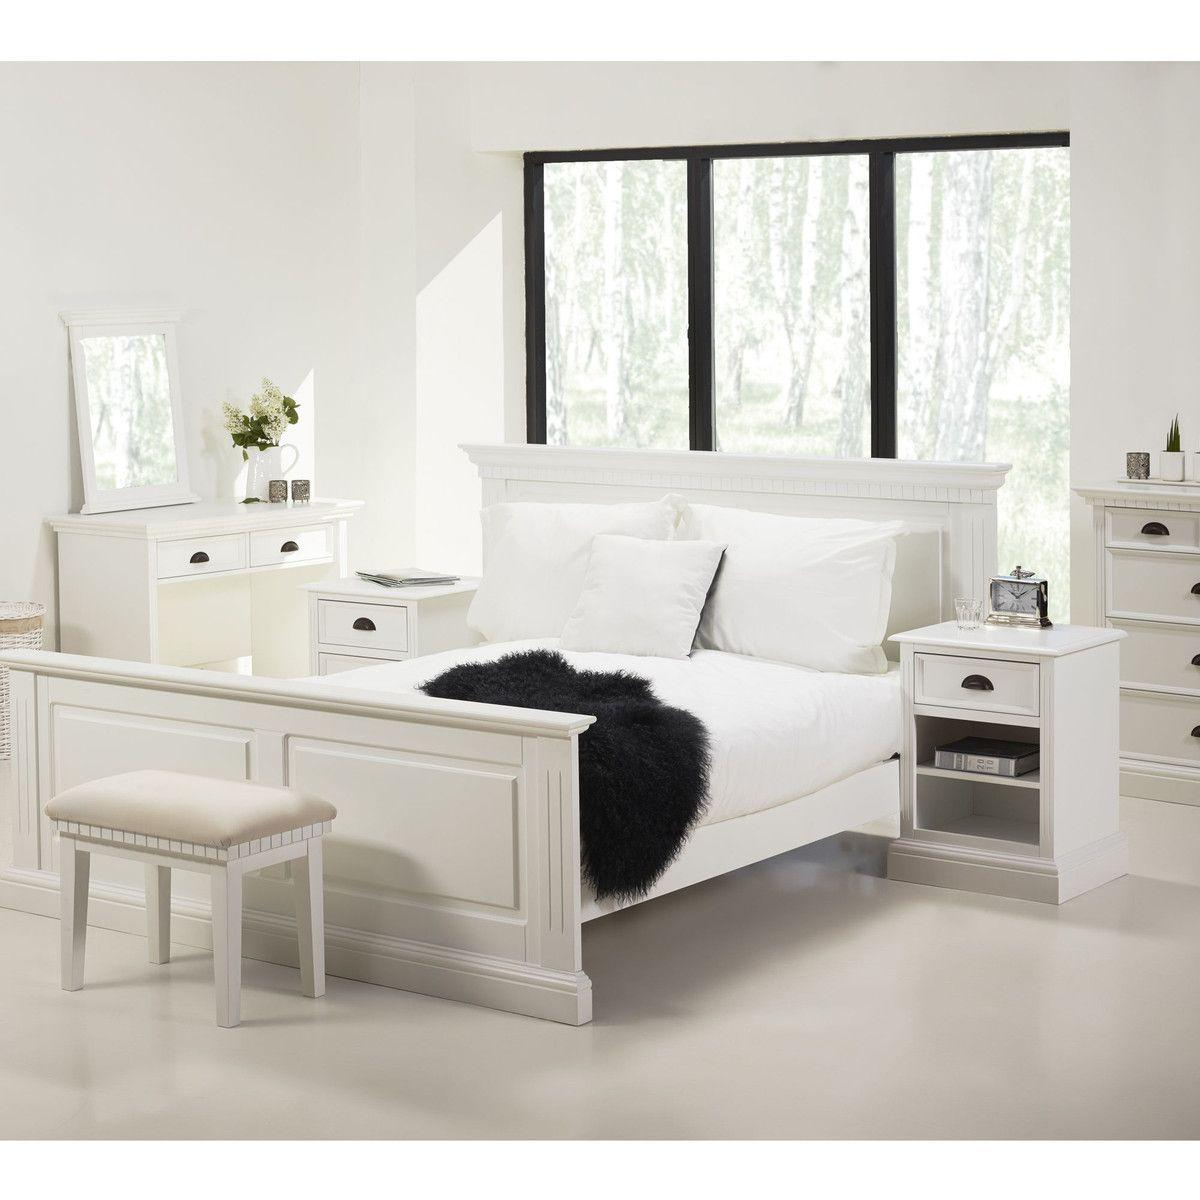 Chambre Wenge Alinea | Chambre Complete Adulte Alinea Beautiful ...